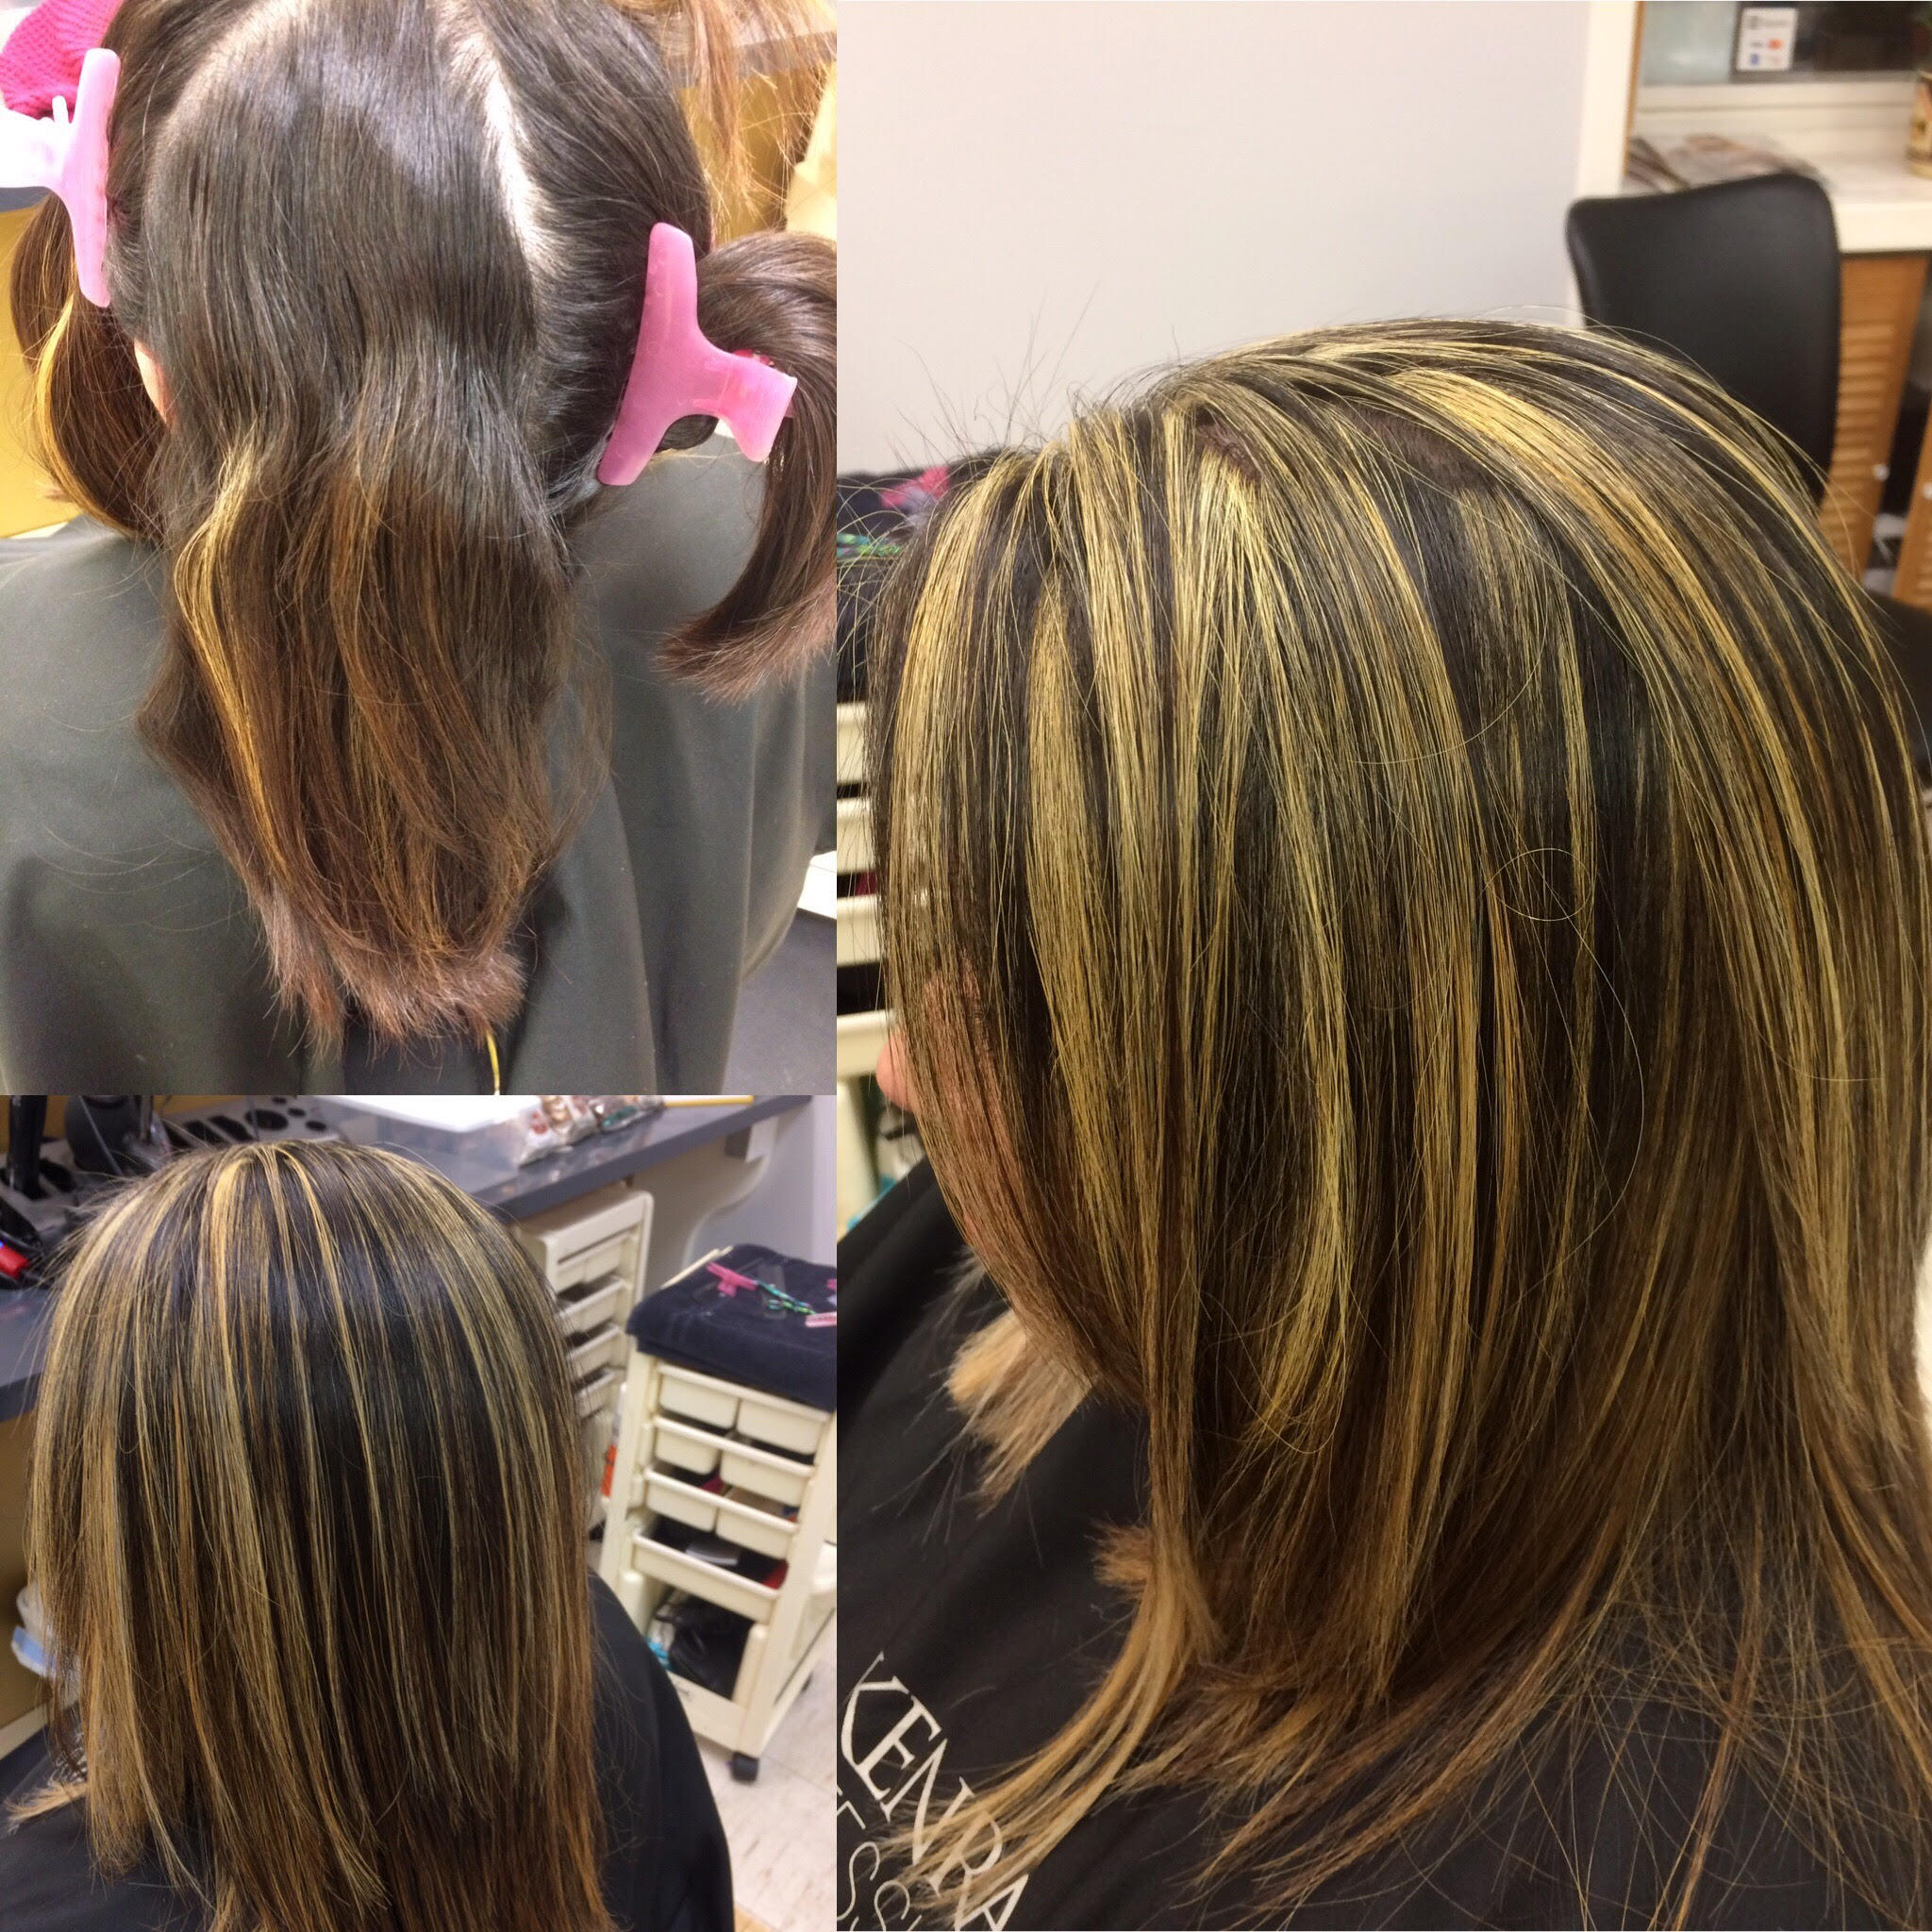 Hair Salon in Bemidji, MN | (218) 751-4509 The Hair Affair